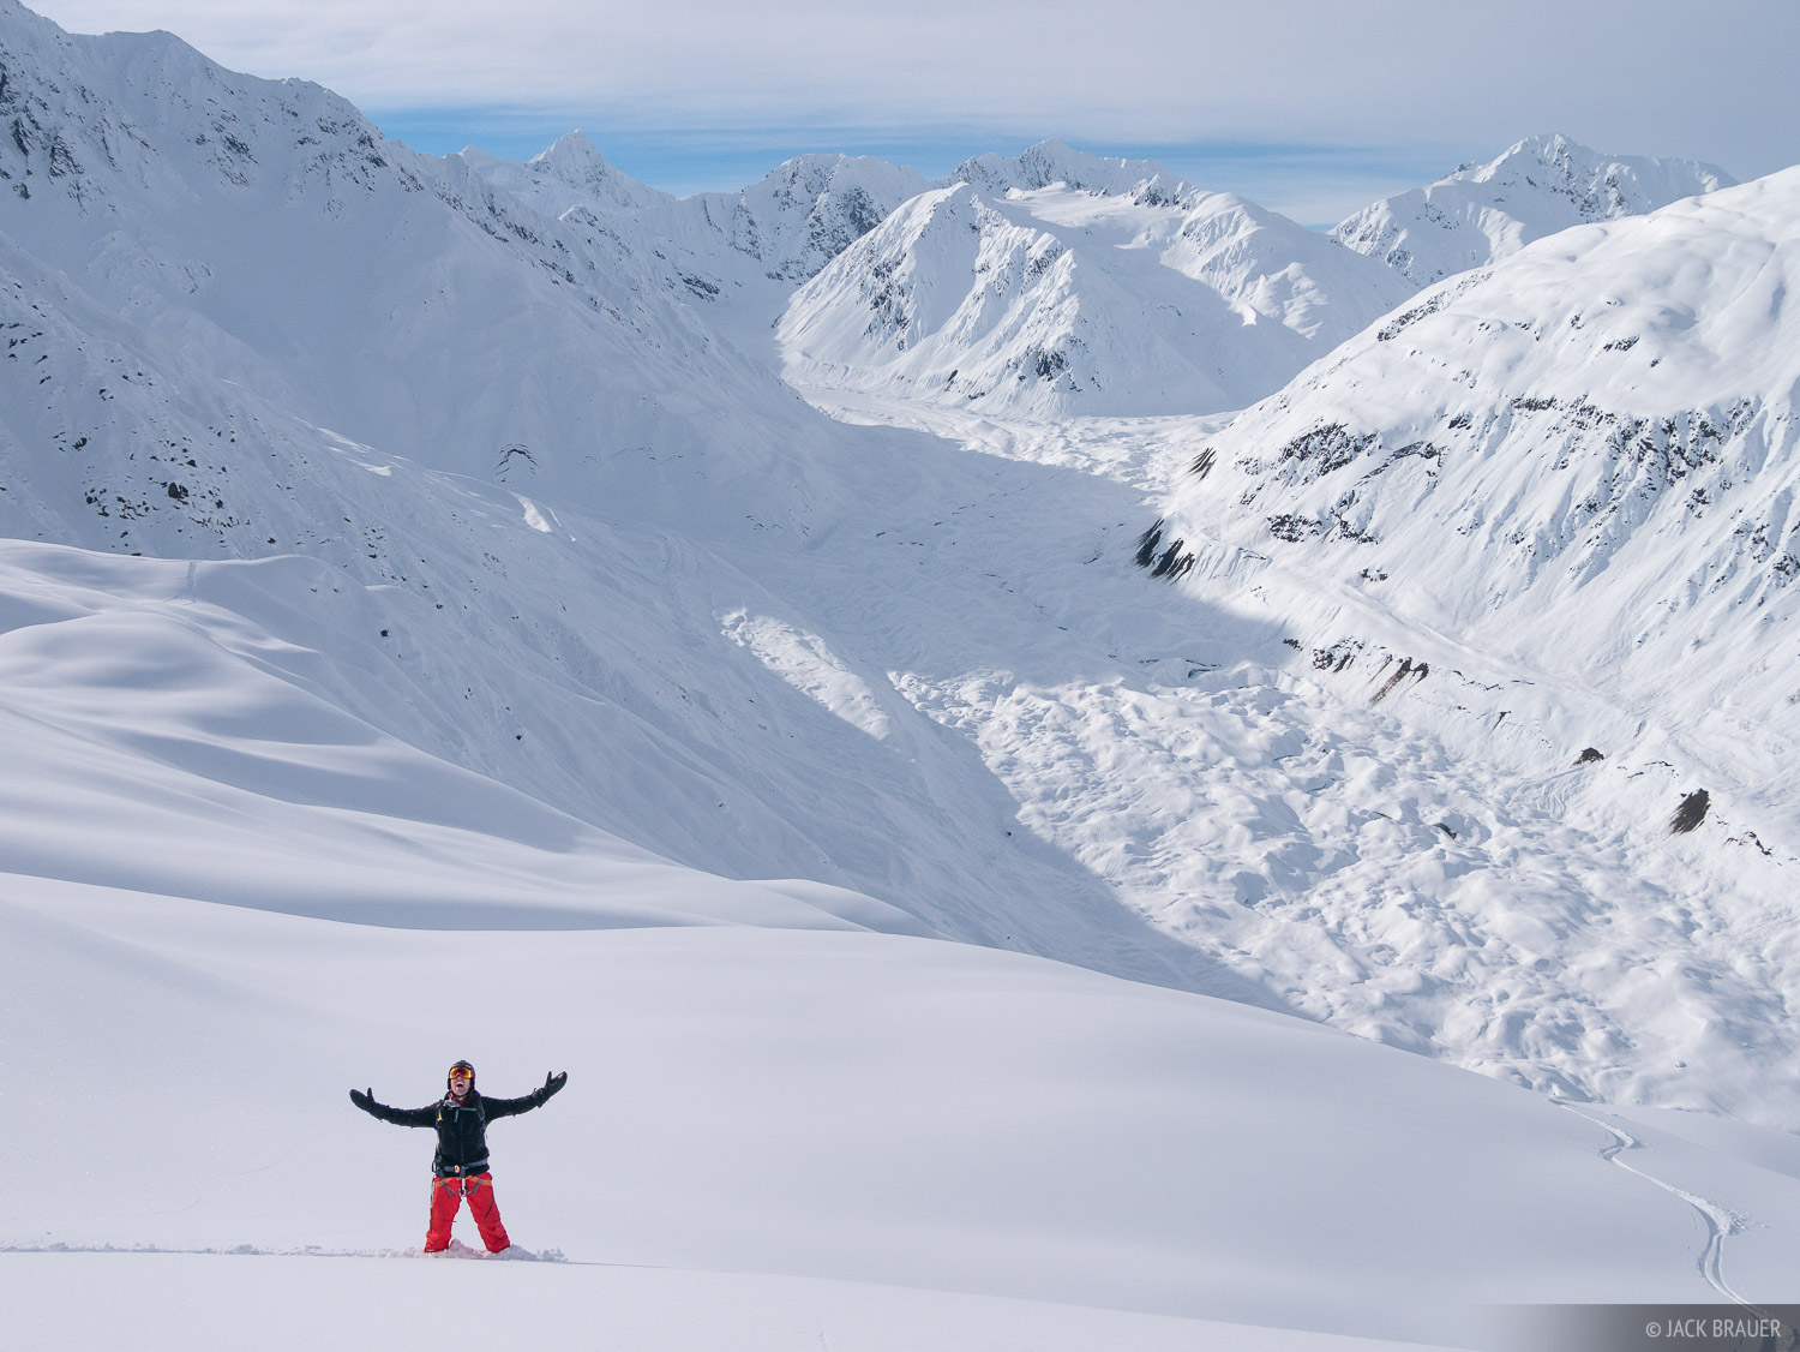 Alaska, Haines, Takhinsha Mountains, snowboarding, March, Takhinsha, winter, active, 2016